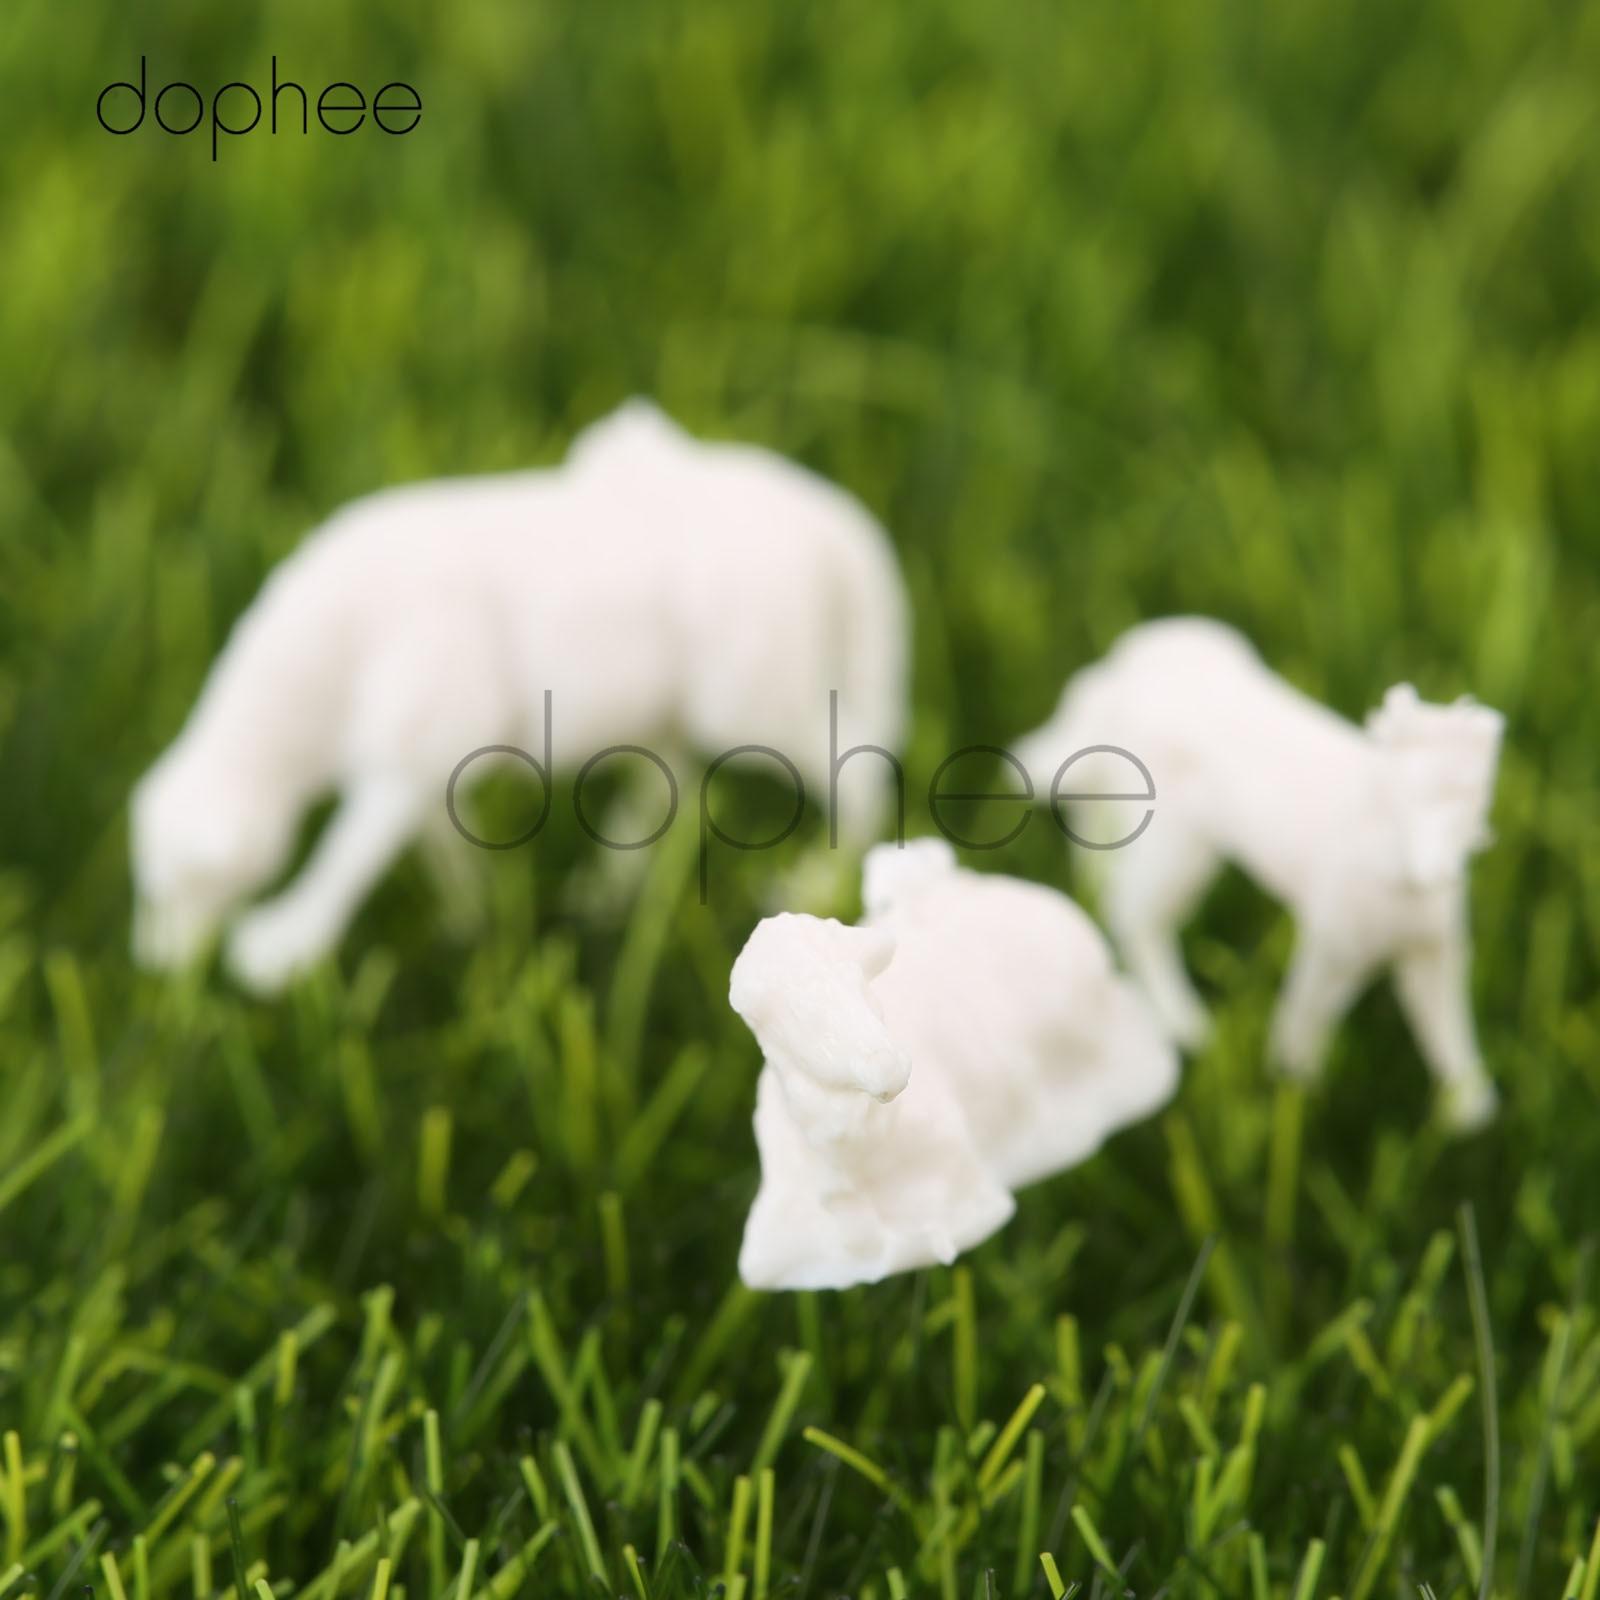 10 Pcs 1:87 Scale Model Painted Color Farm Animals Cows for Model Architecture